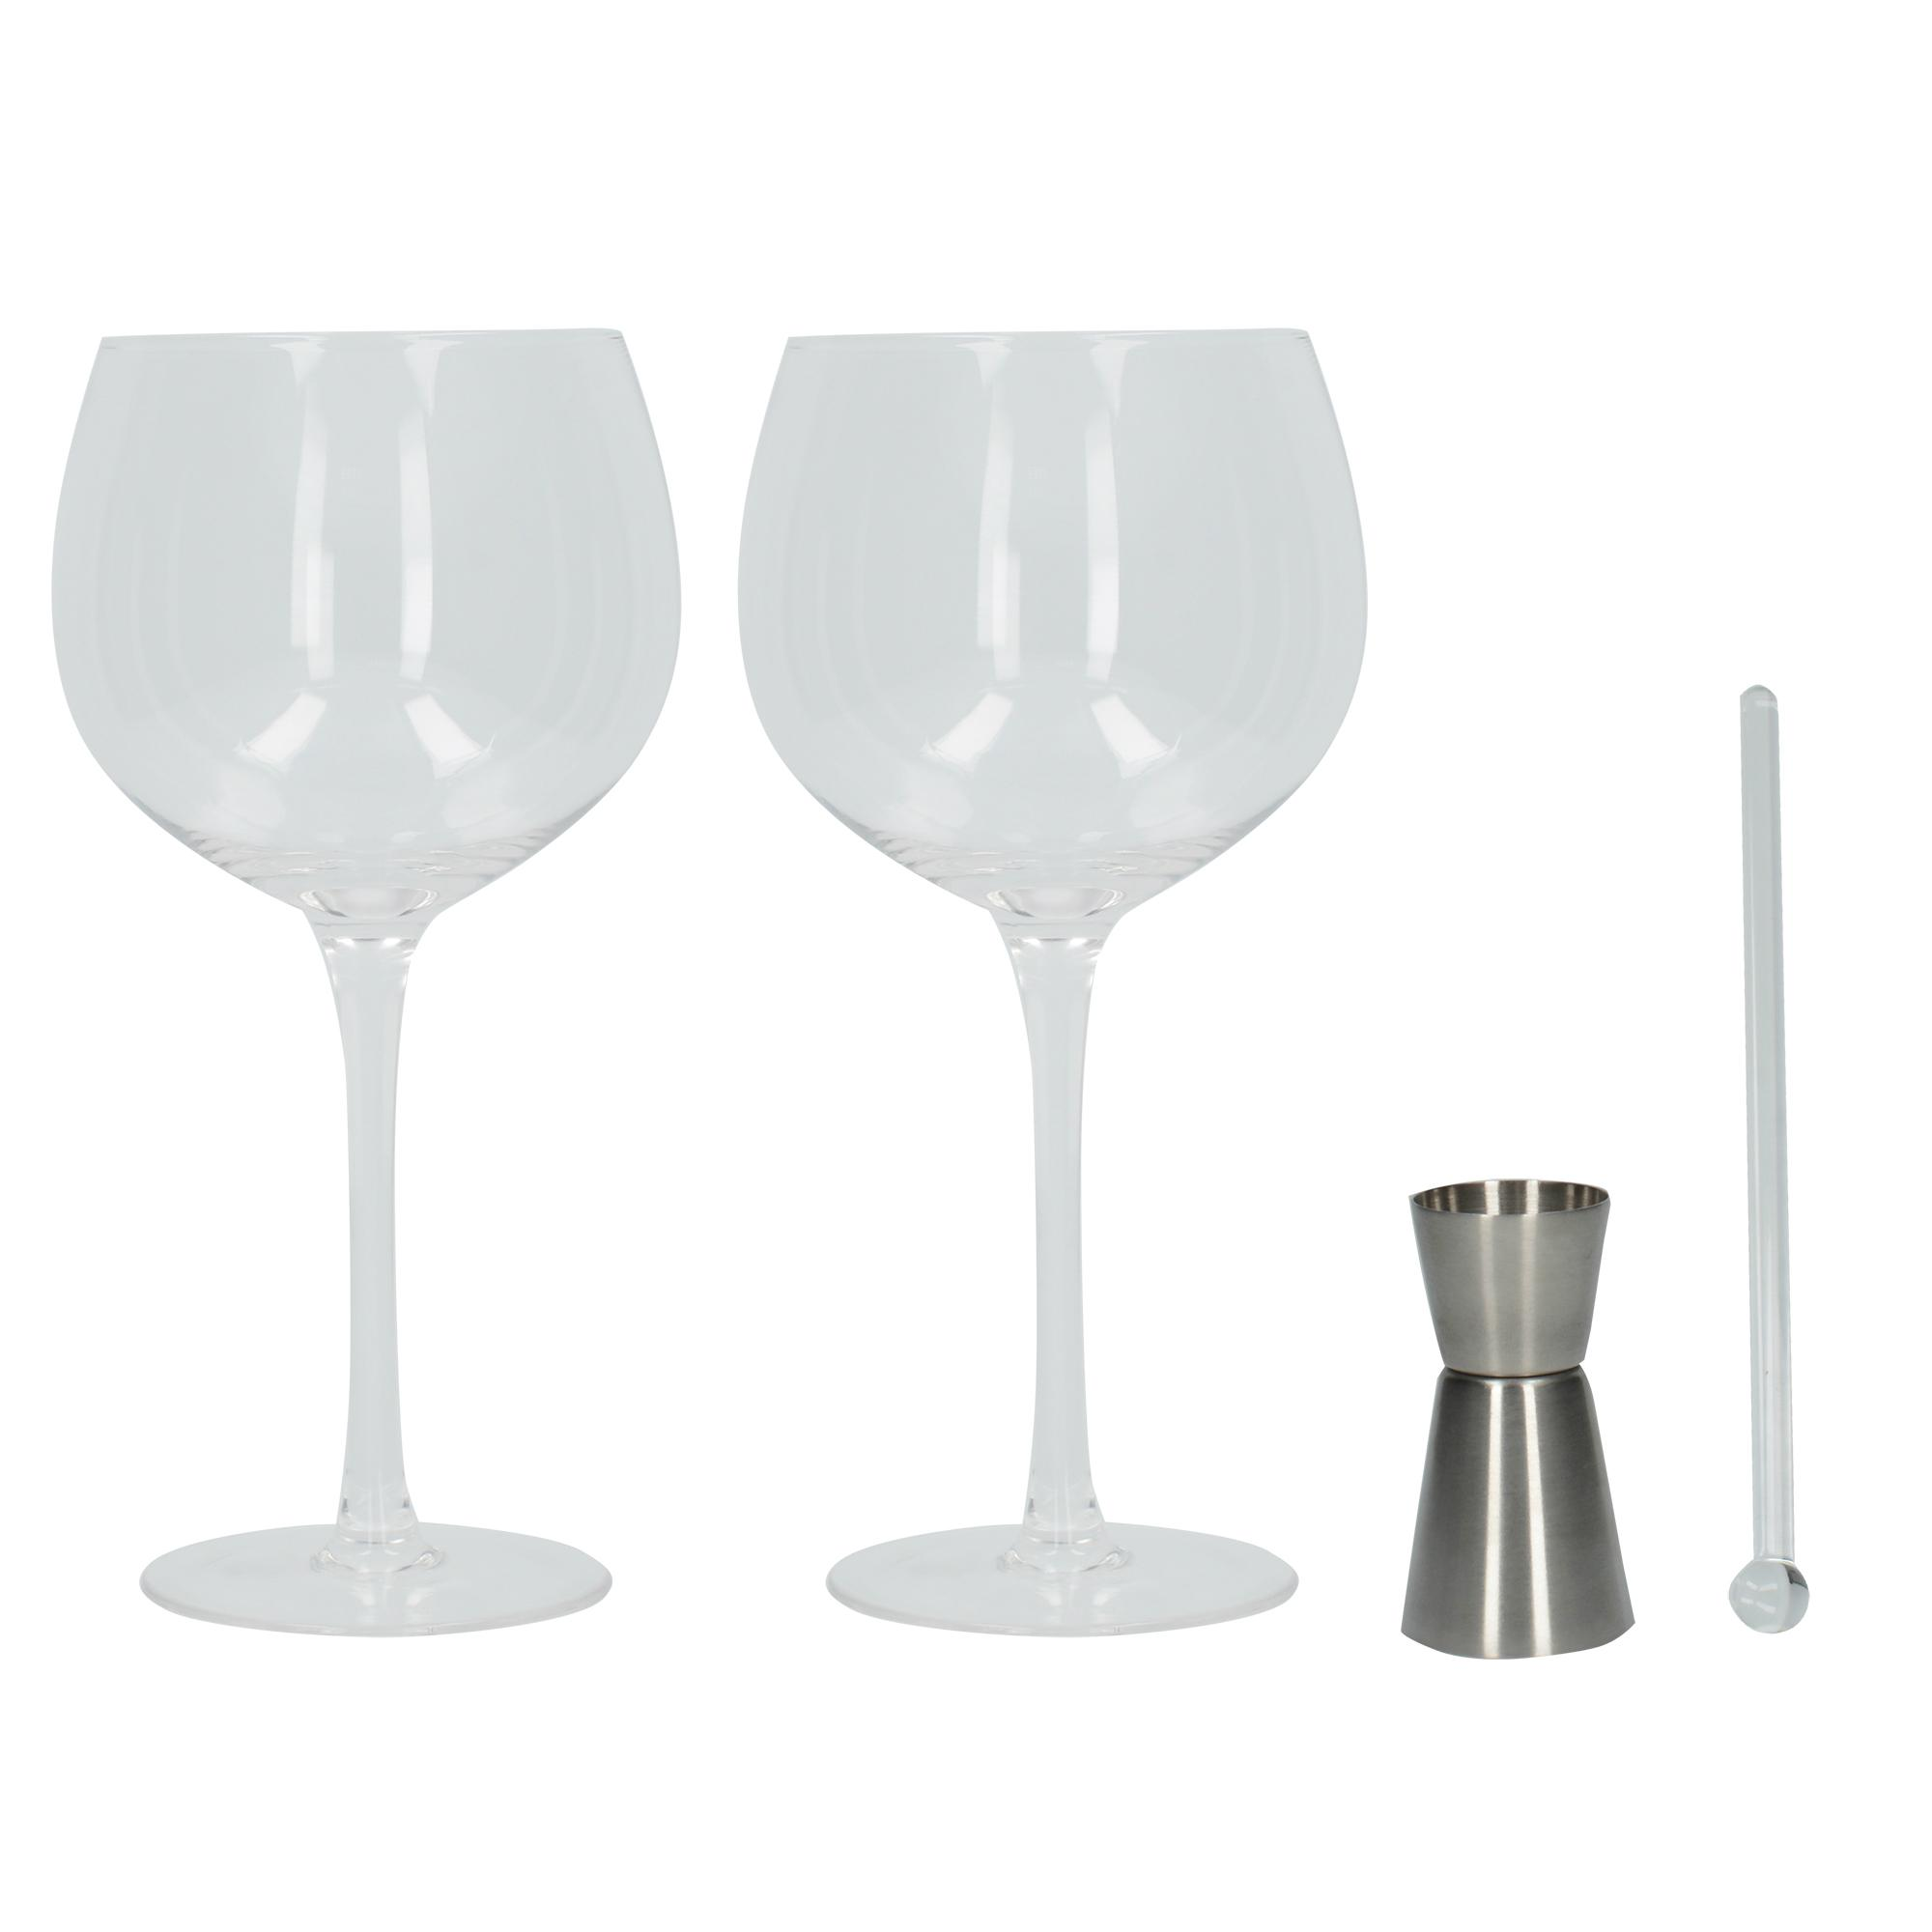 Creative Tops Mikasa Cheers Balloon Gin Copa Goblets Glasses set of 4